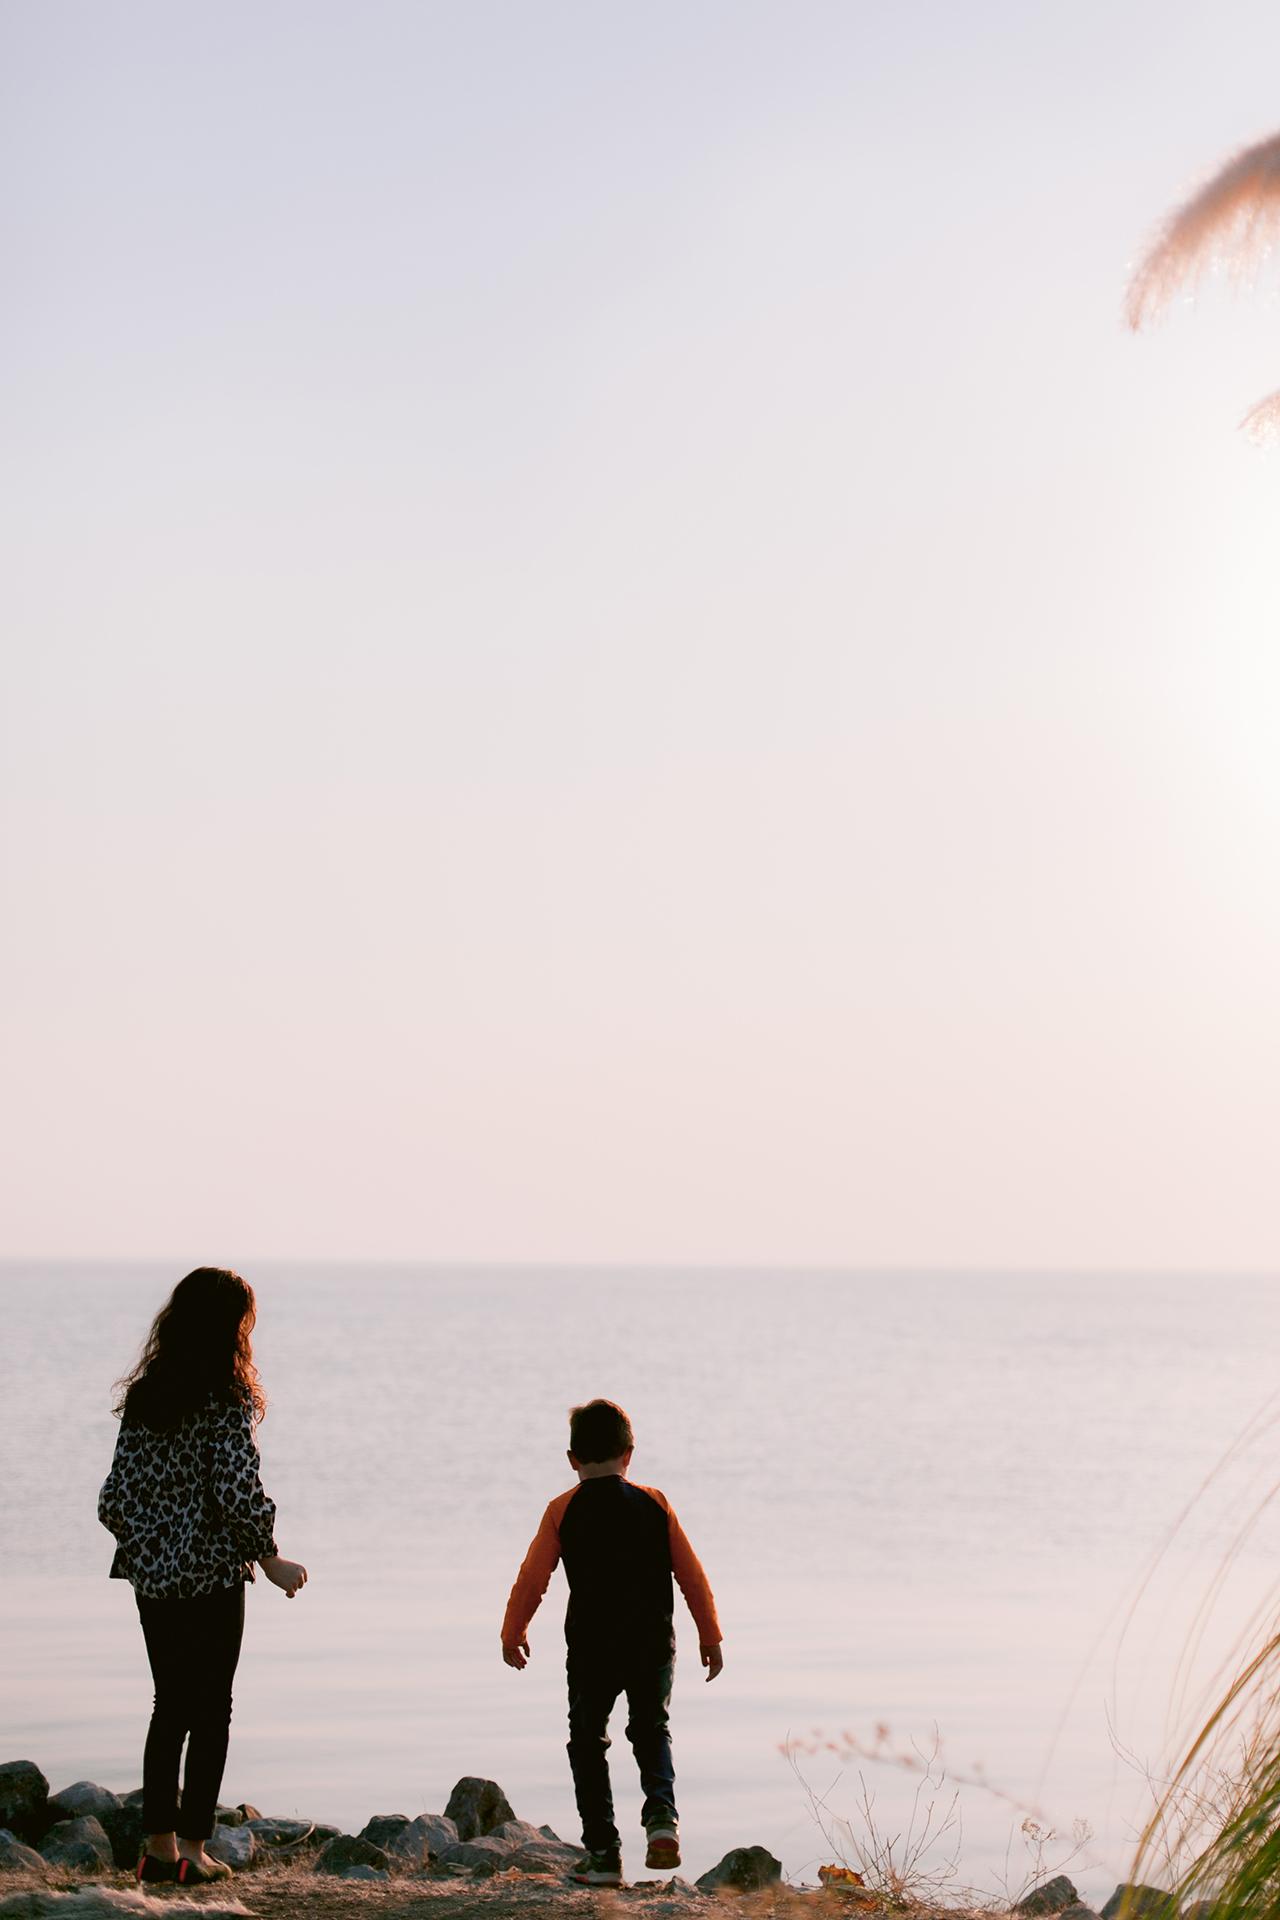 Alameda_Children_and_Family_Portrait_002.jpg